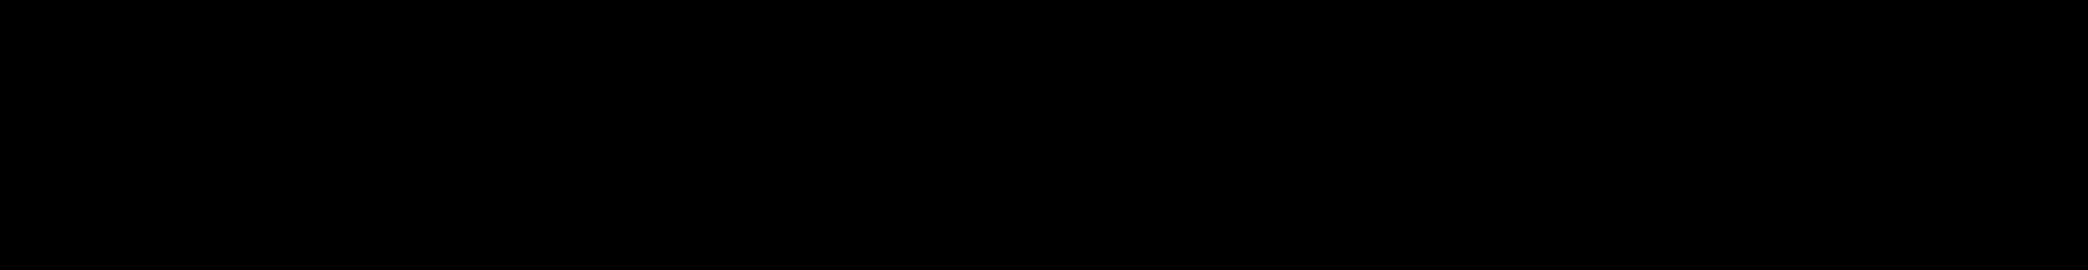 Mews Connector logo